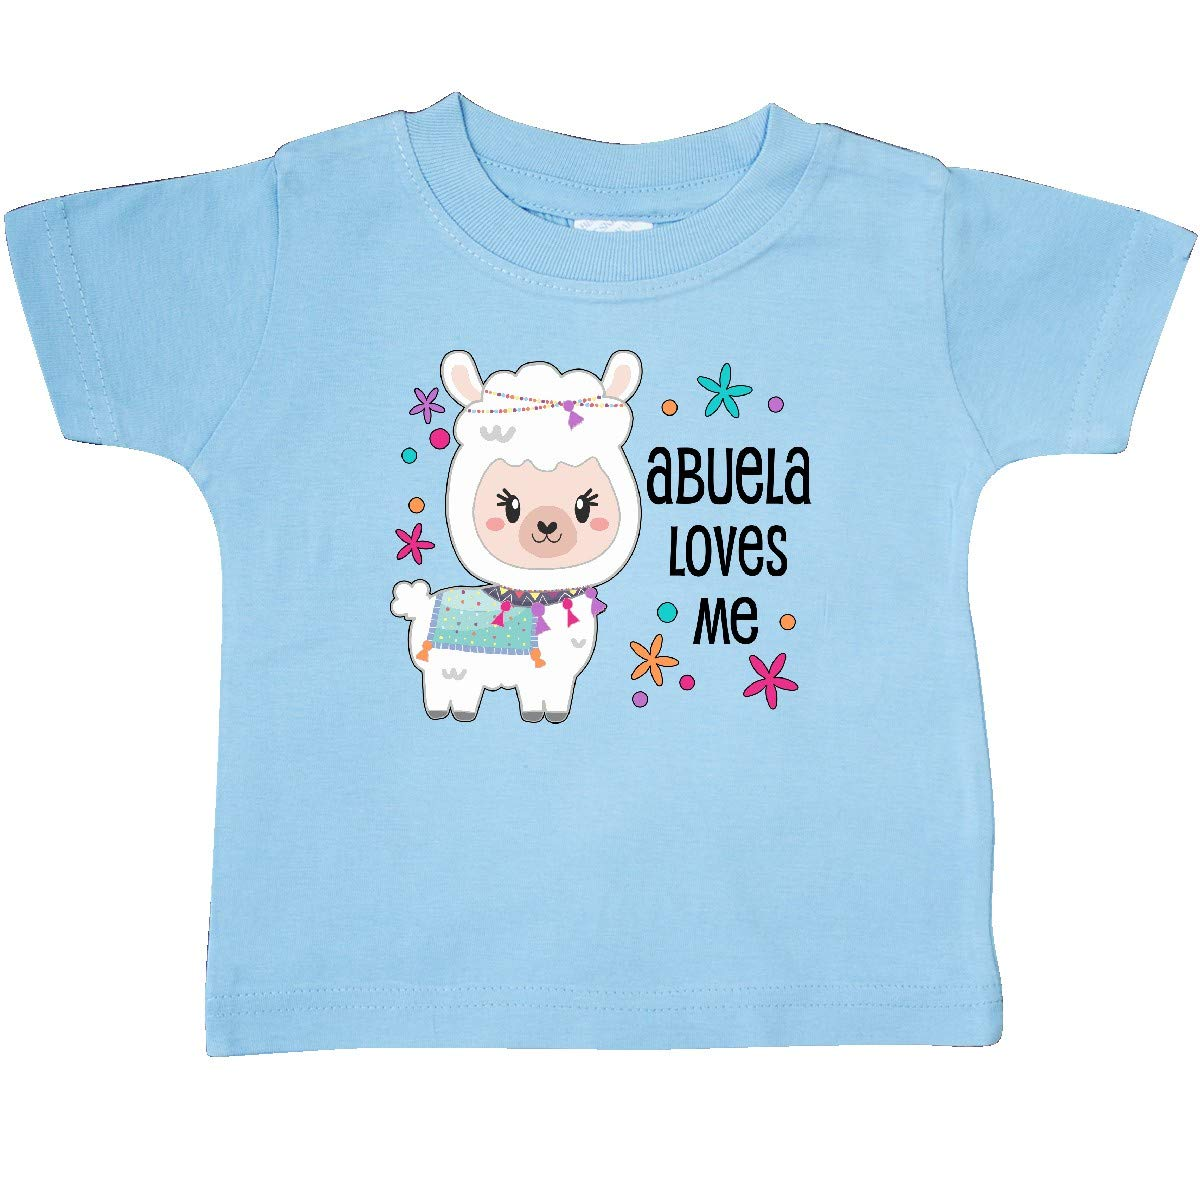 Cute and Happy Llama Baby T-Shirt inktastic Abuela Loves Me